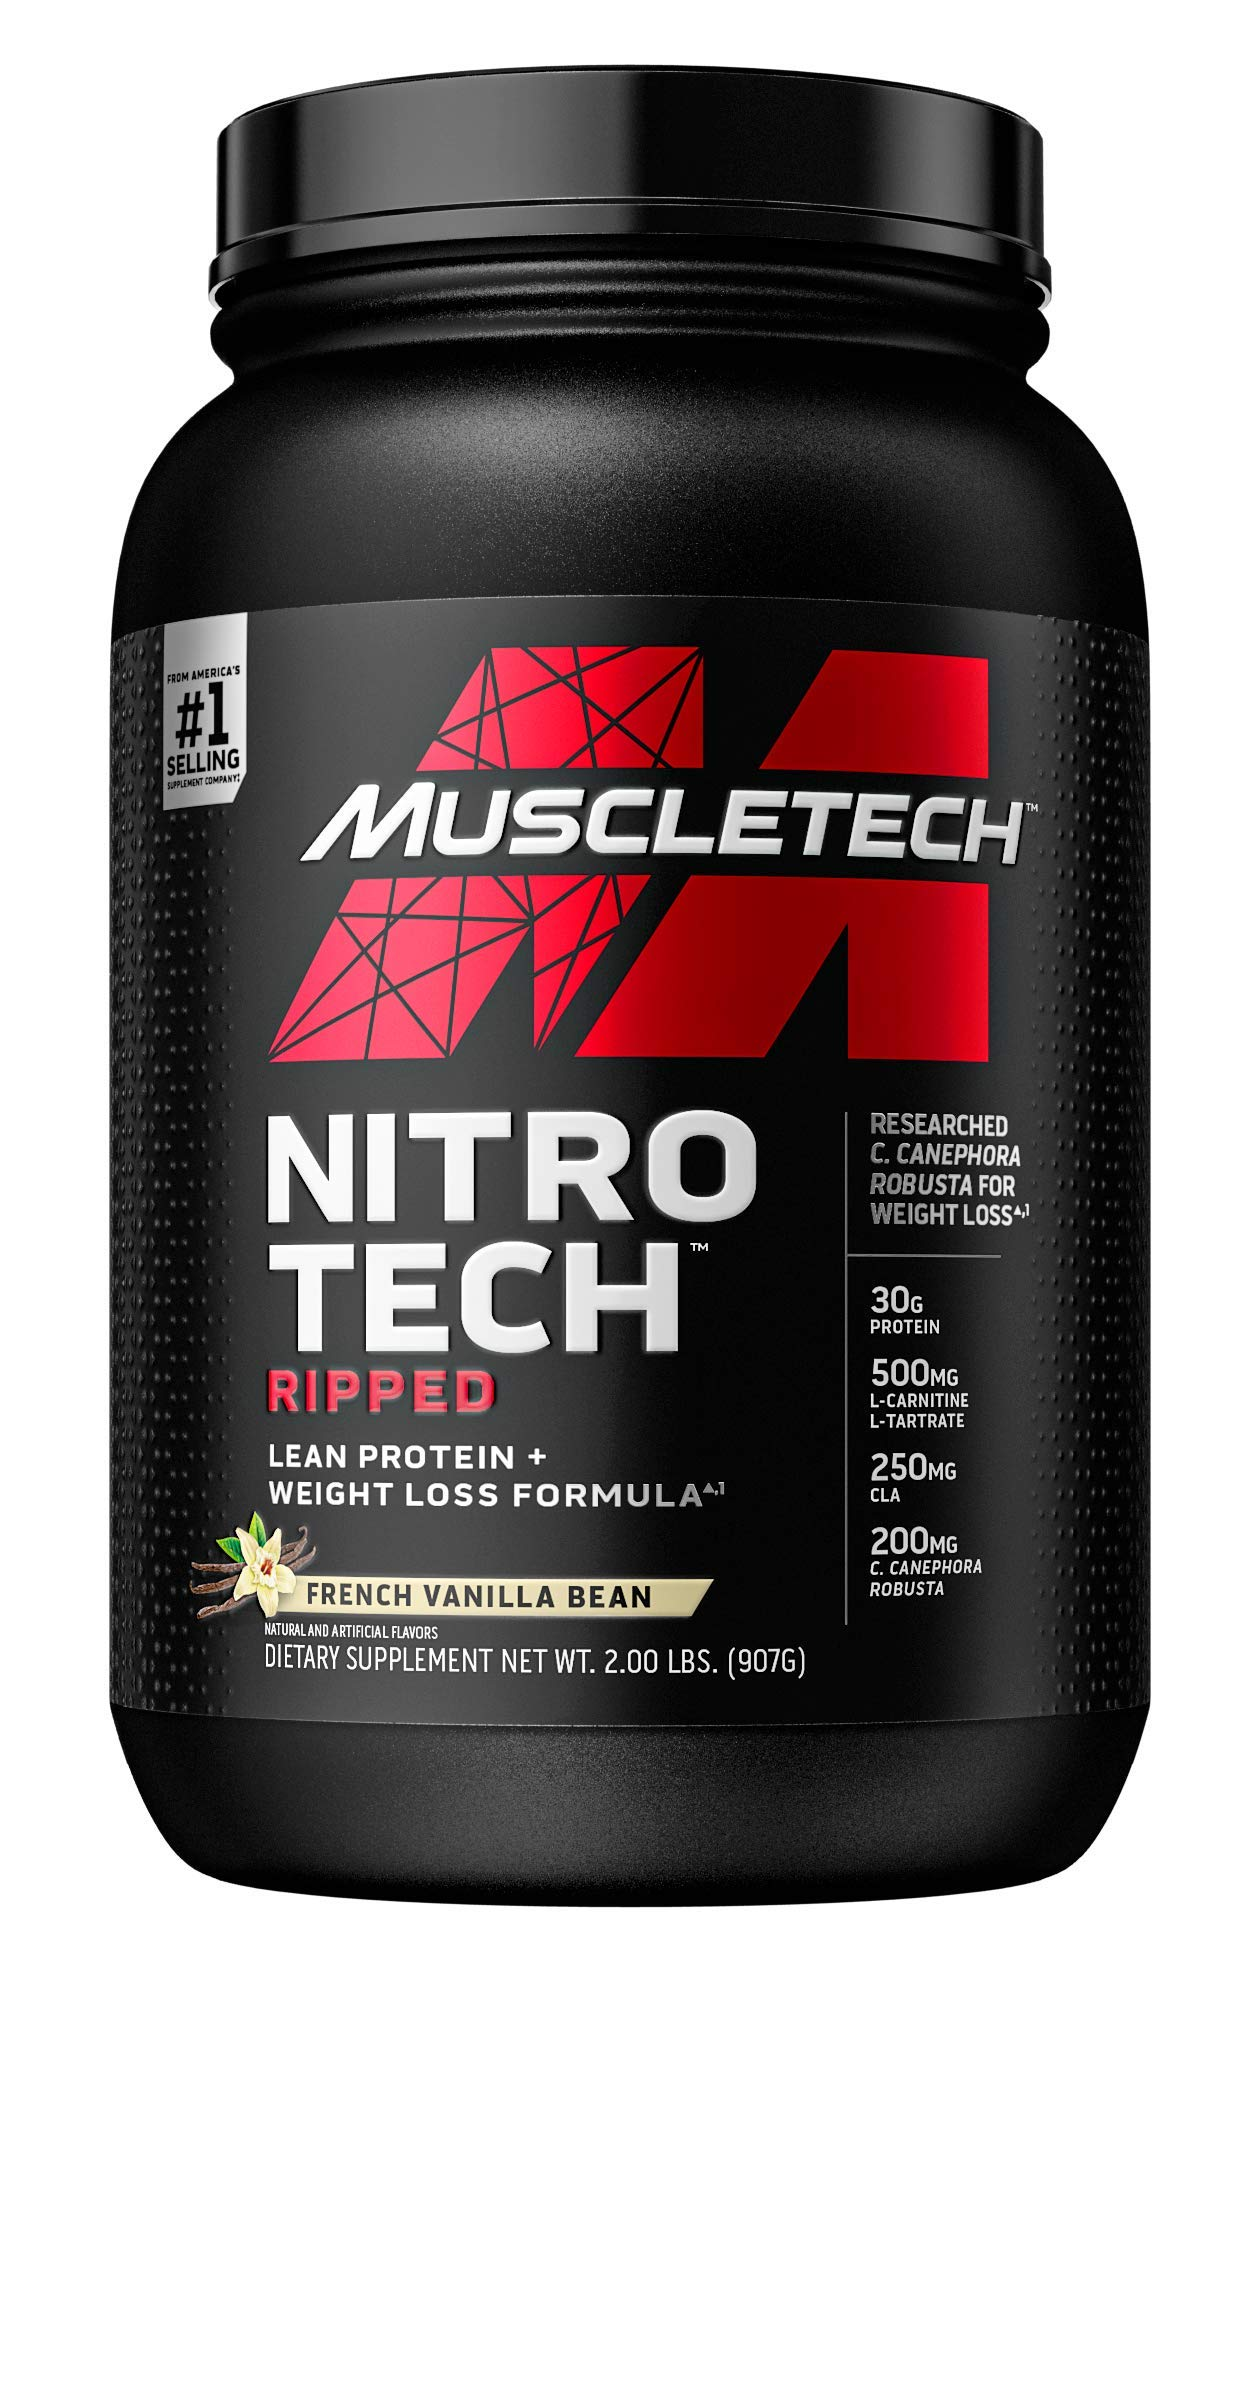 Muscletech Performance Series Nitro-Tech Ripped Supplement, 2 lbs, French Vanilla Swirl